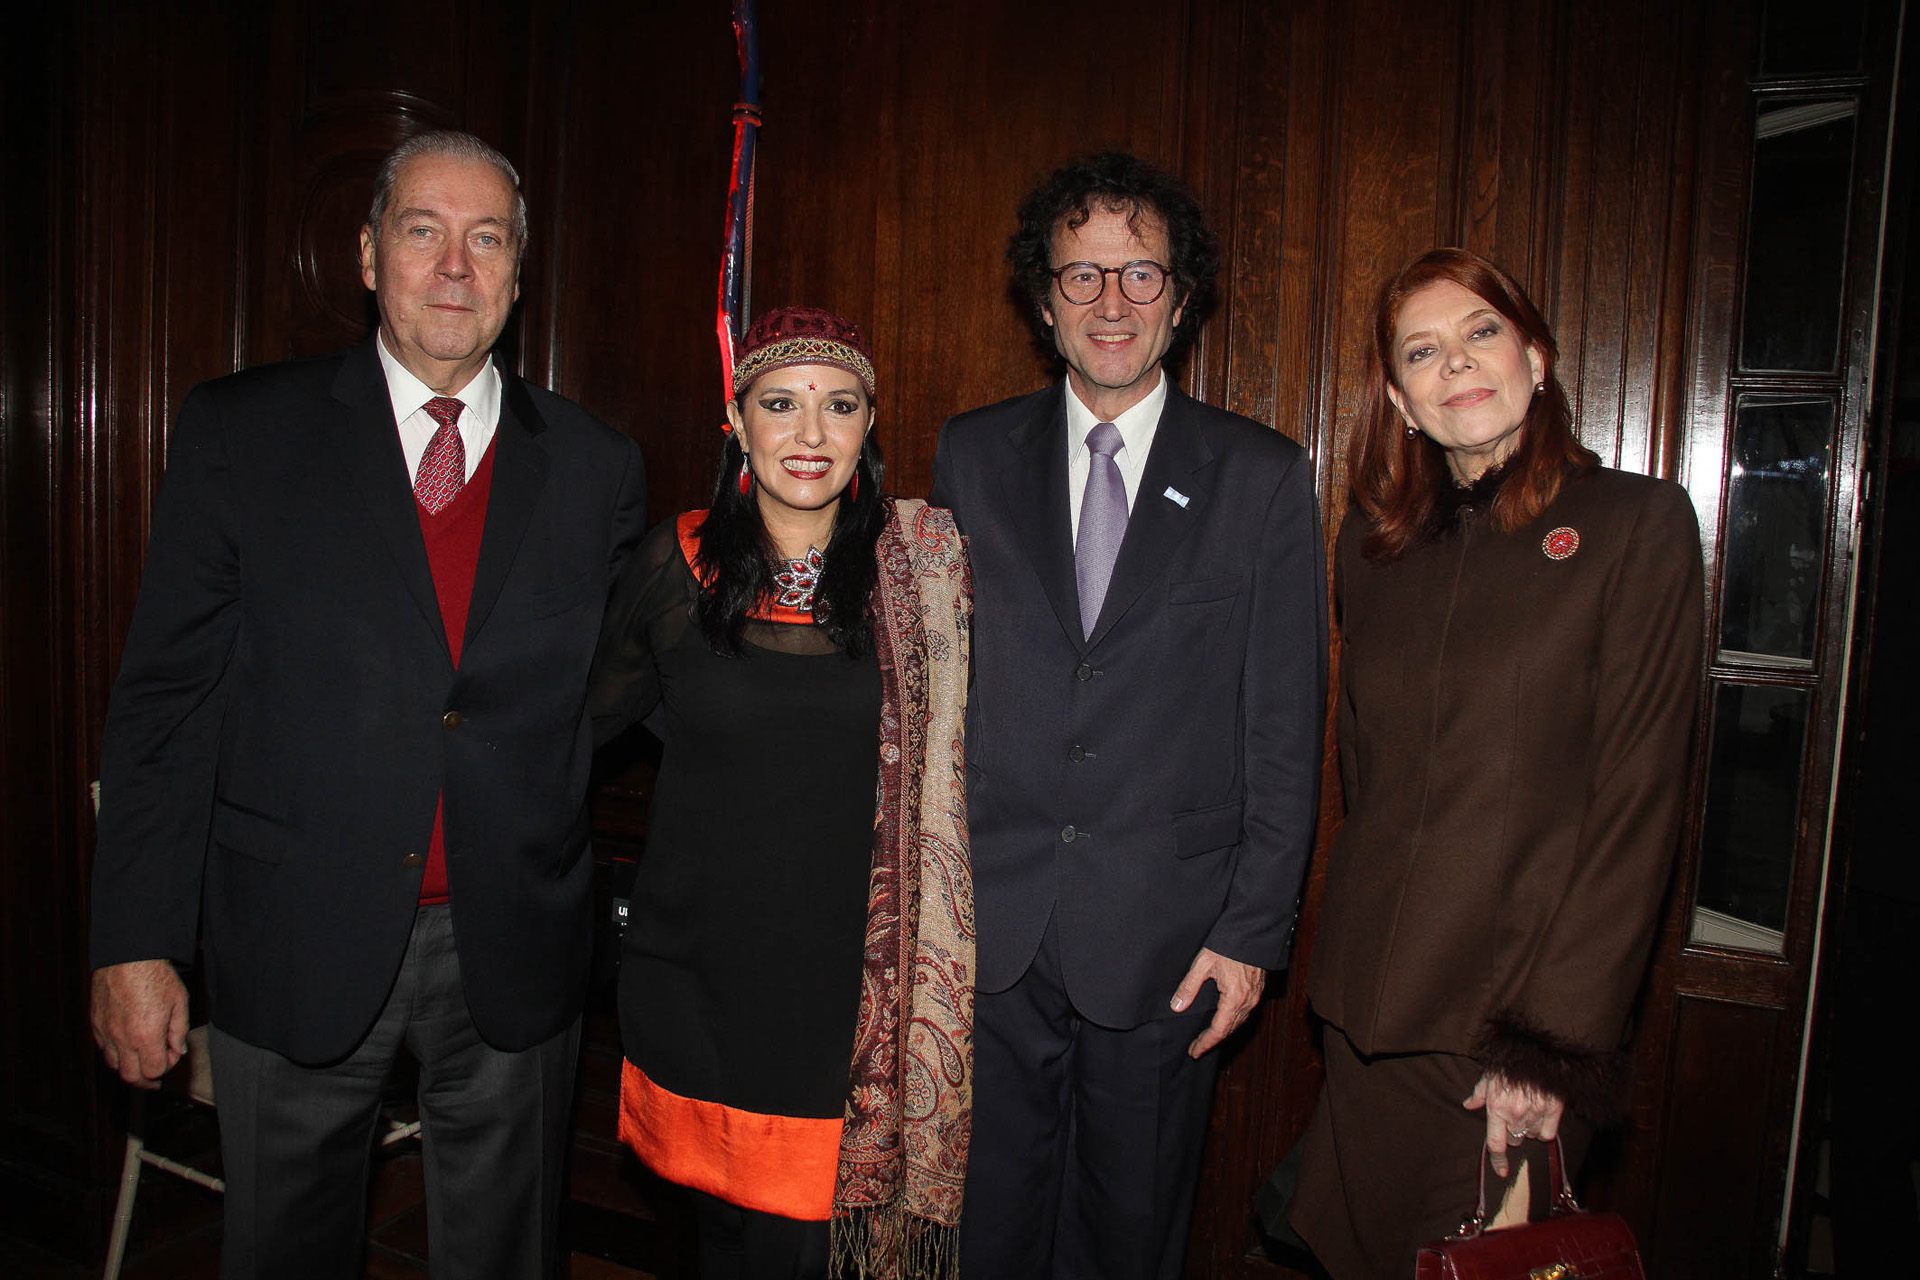 Alejandro Carlos Kipp, Jimena La Torre, Lucas Beccar Varela y Ana Lorenzutti